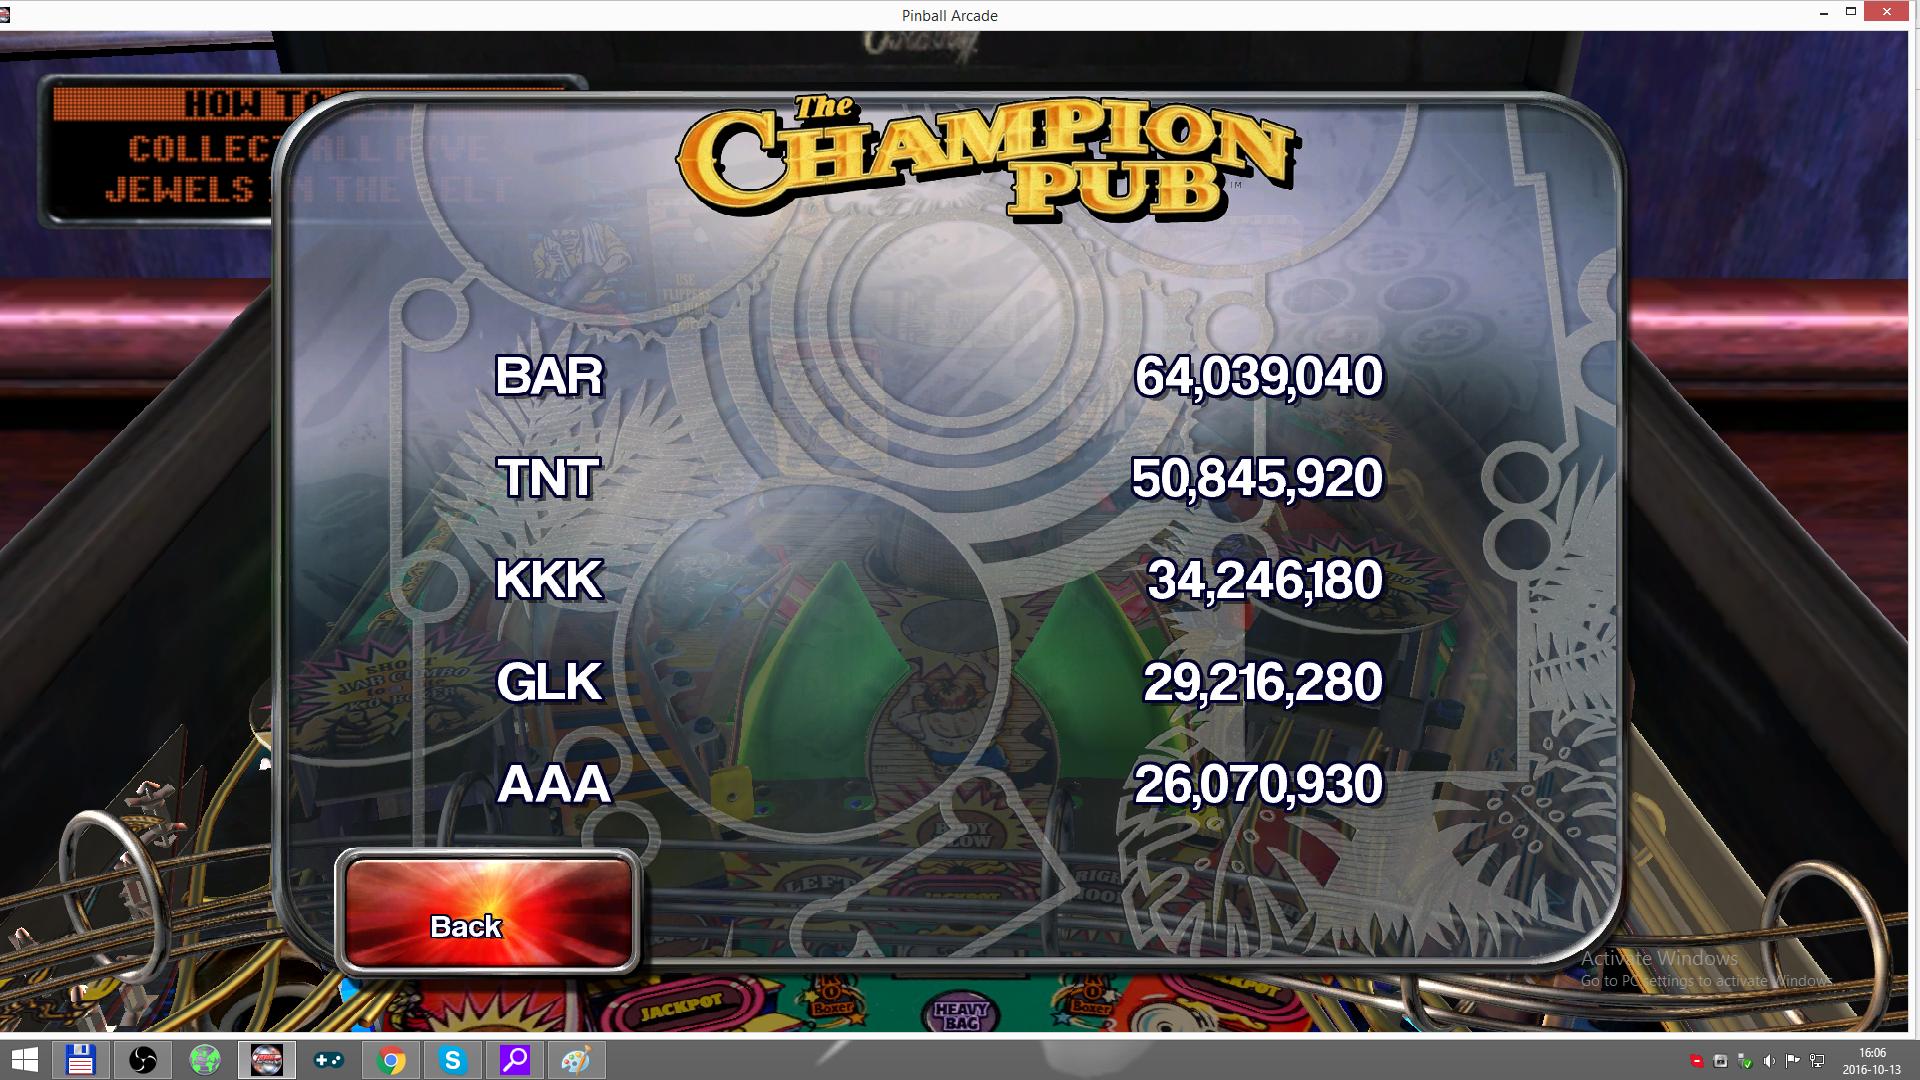 Pinball Arcade: The Champion Pub 26,070,930 points